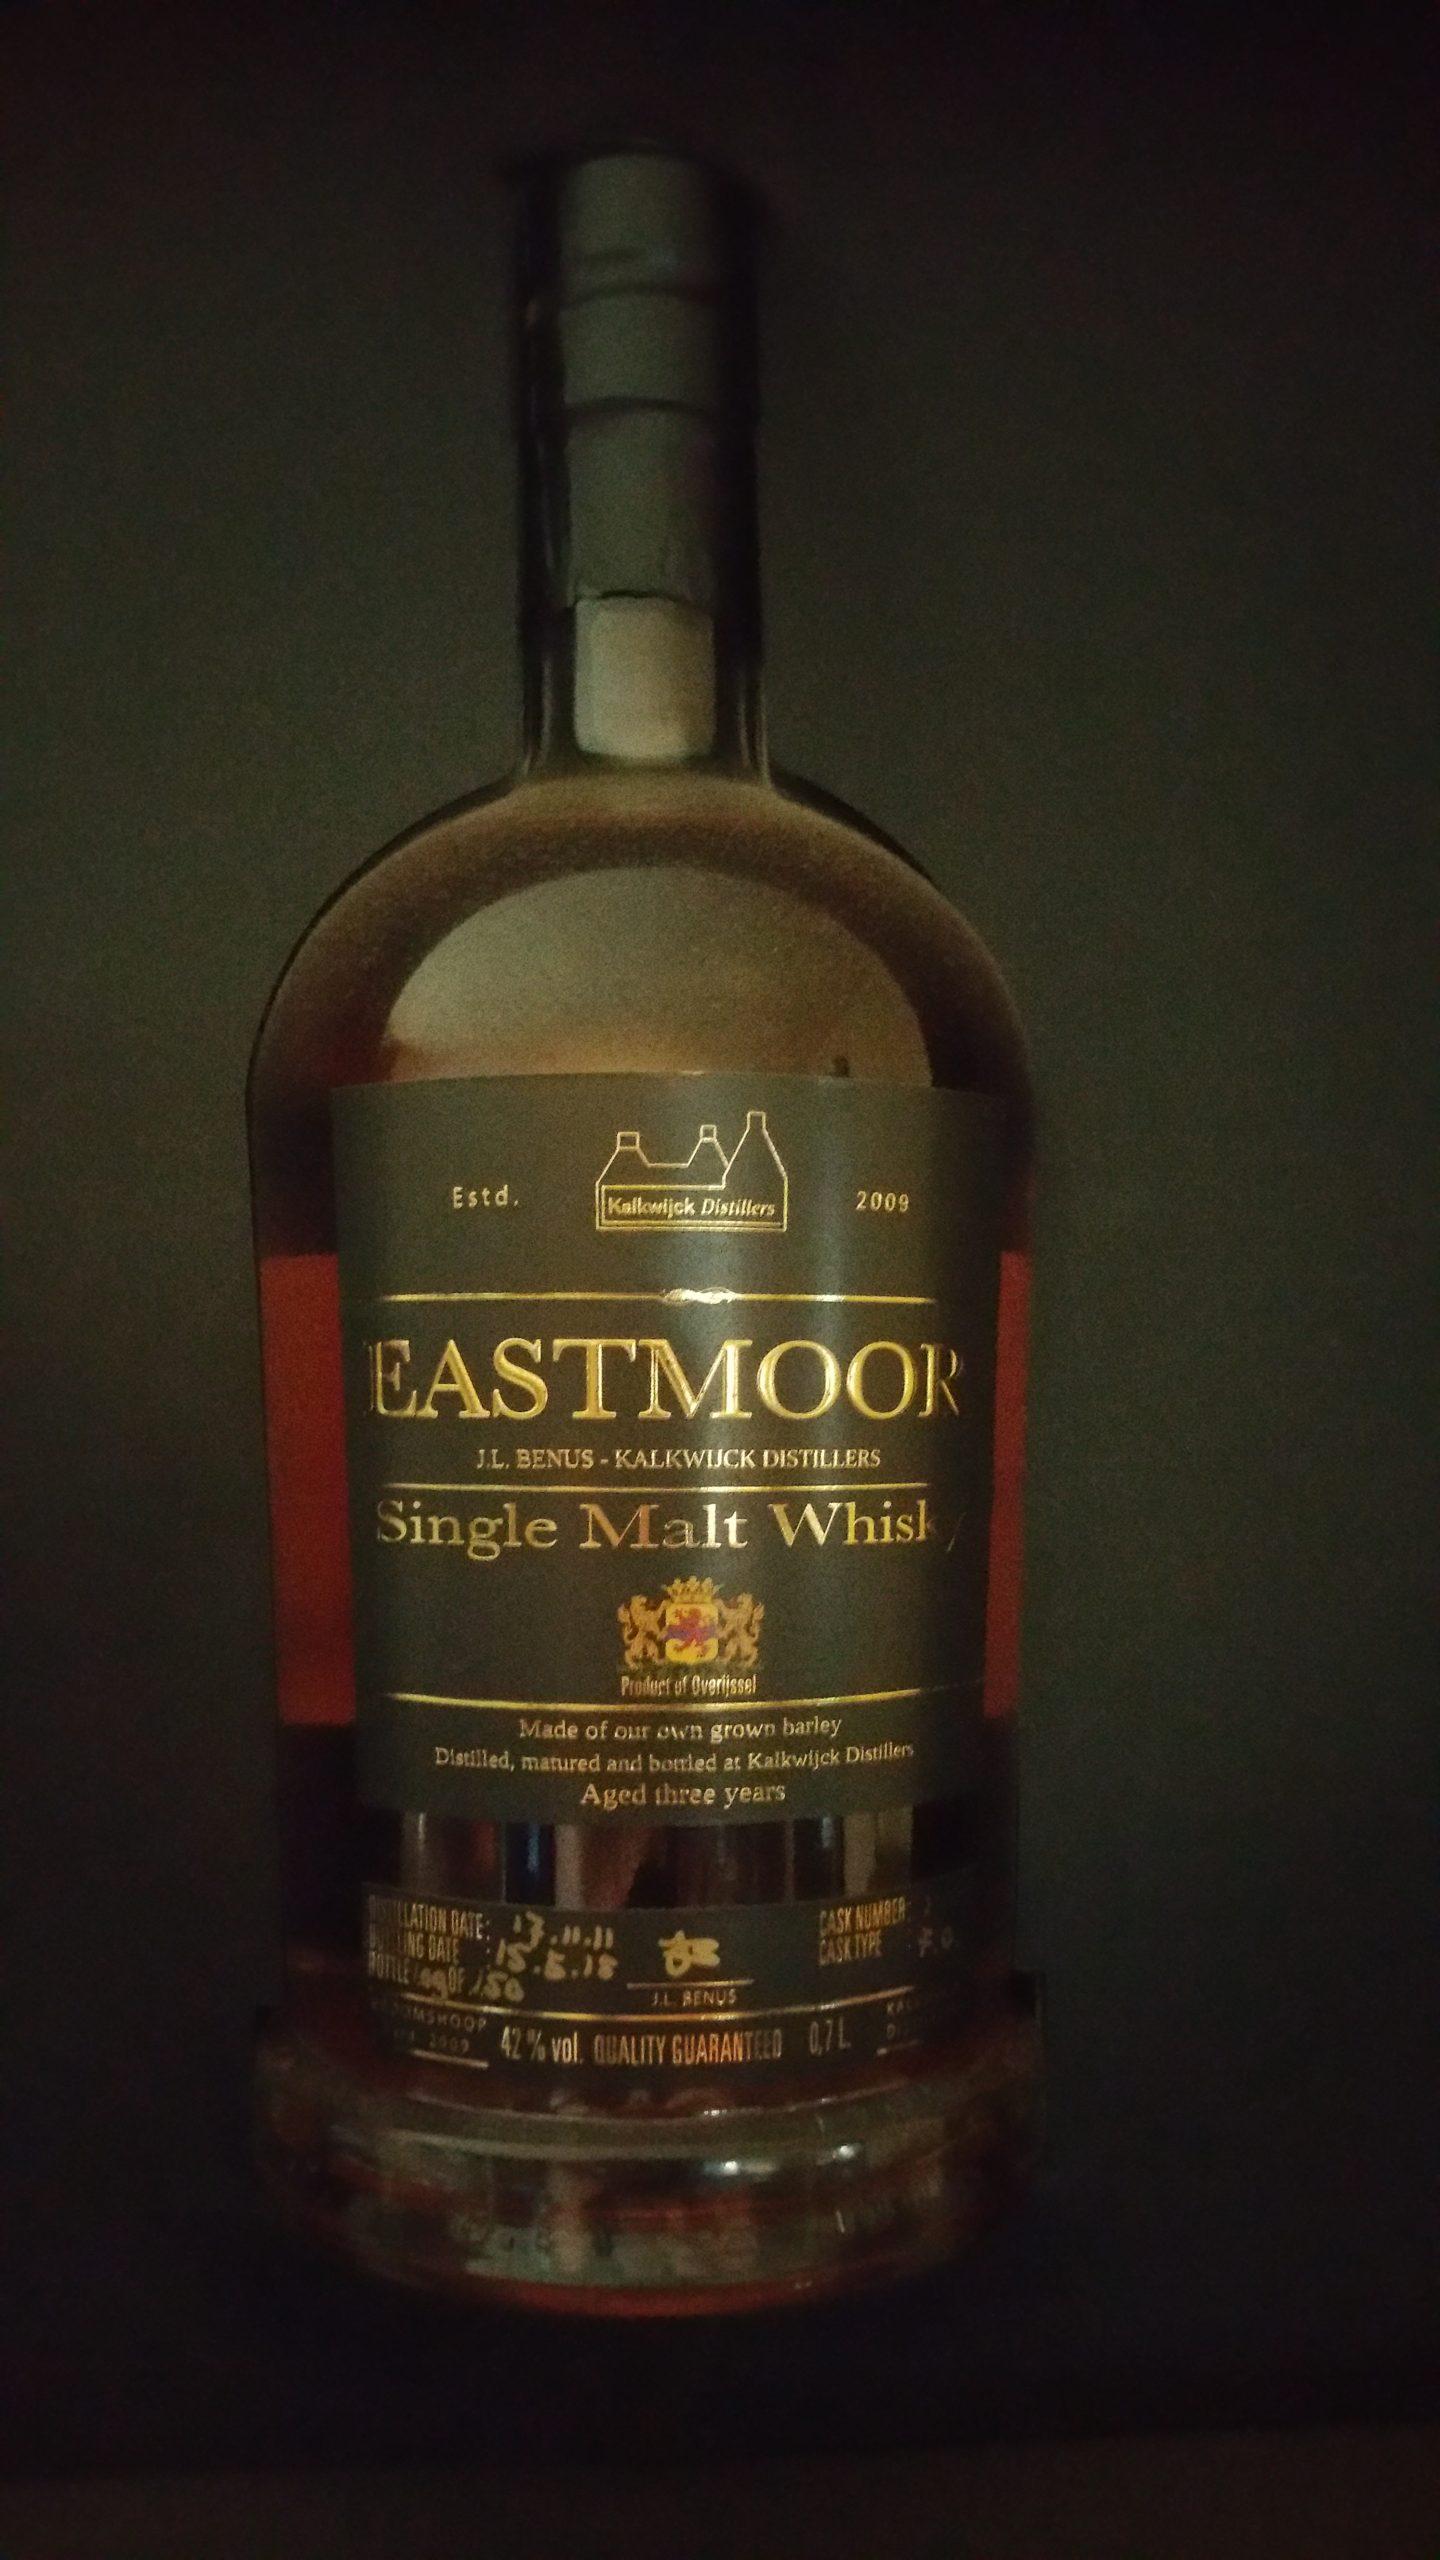 Eastmoor Single Malt Whisky